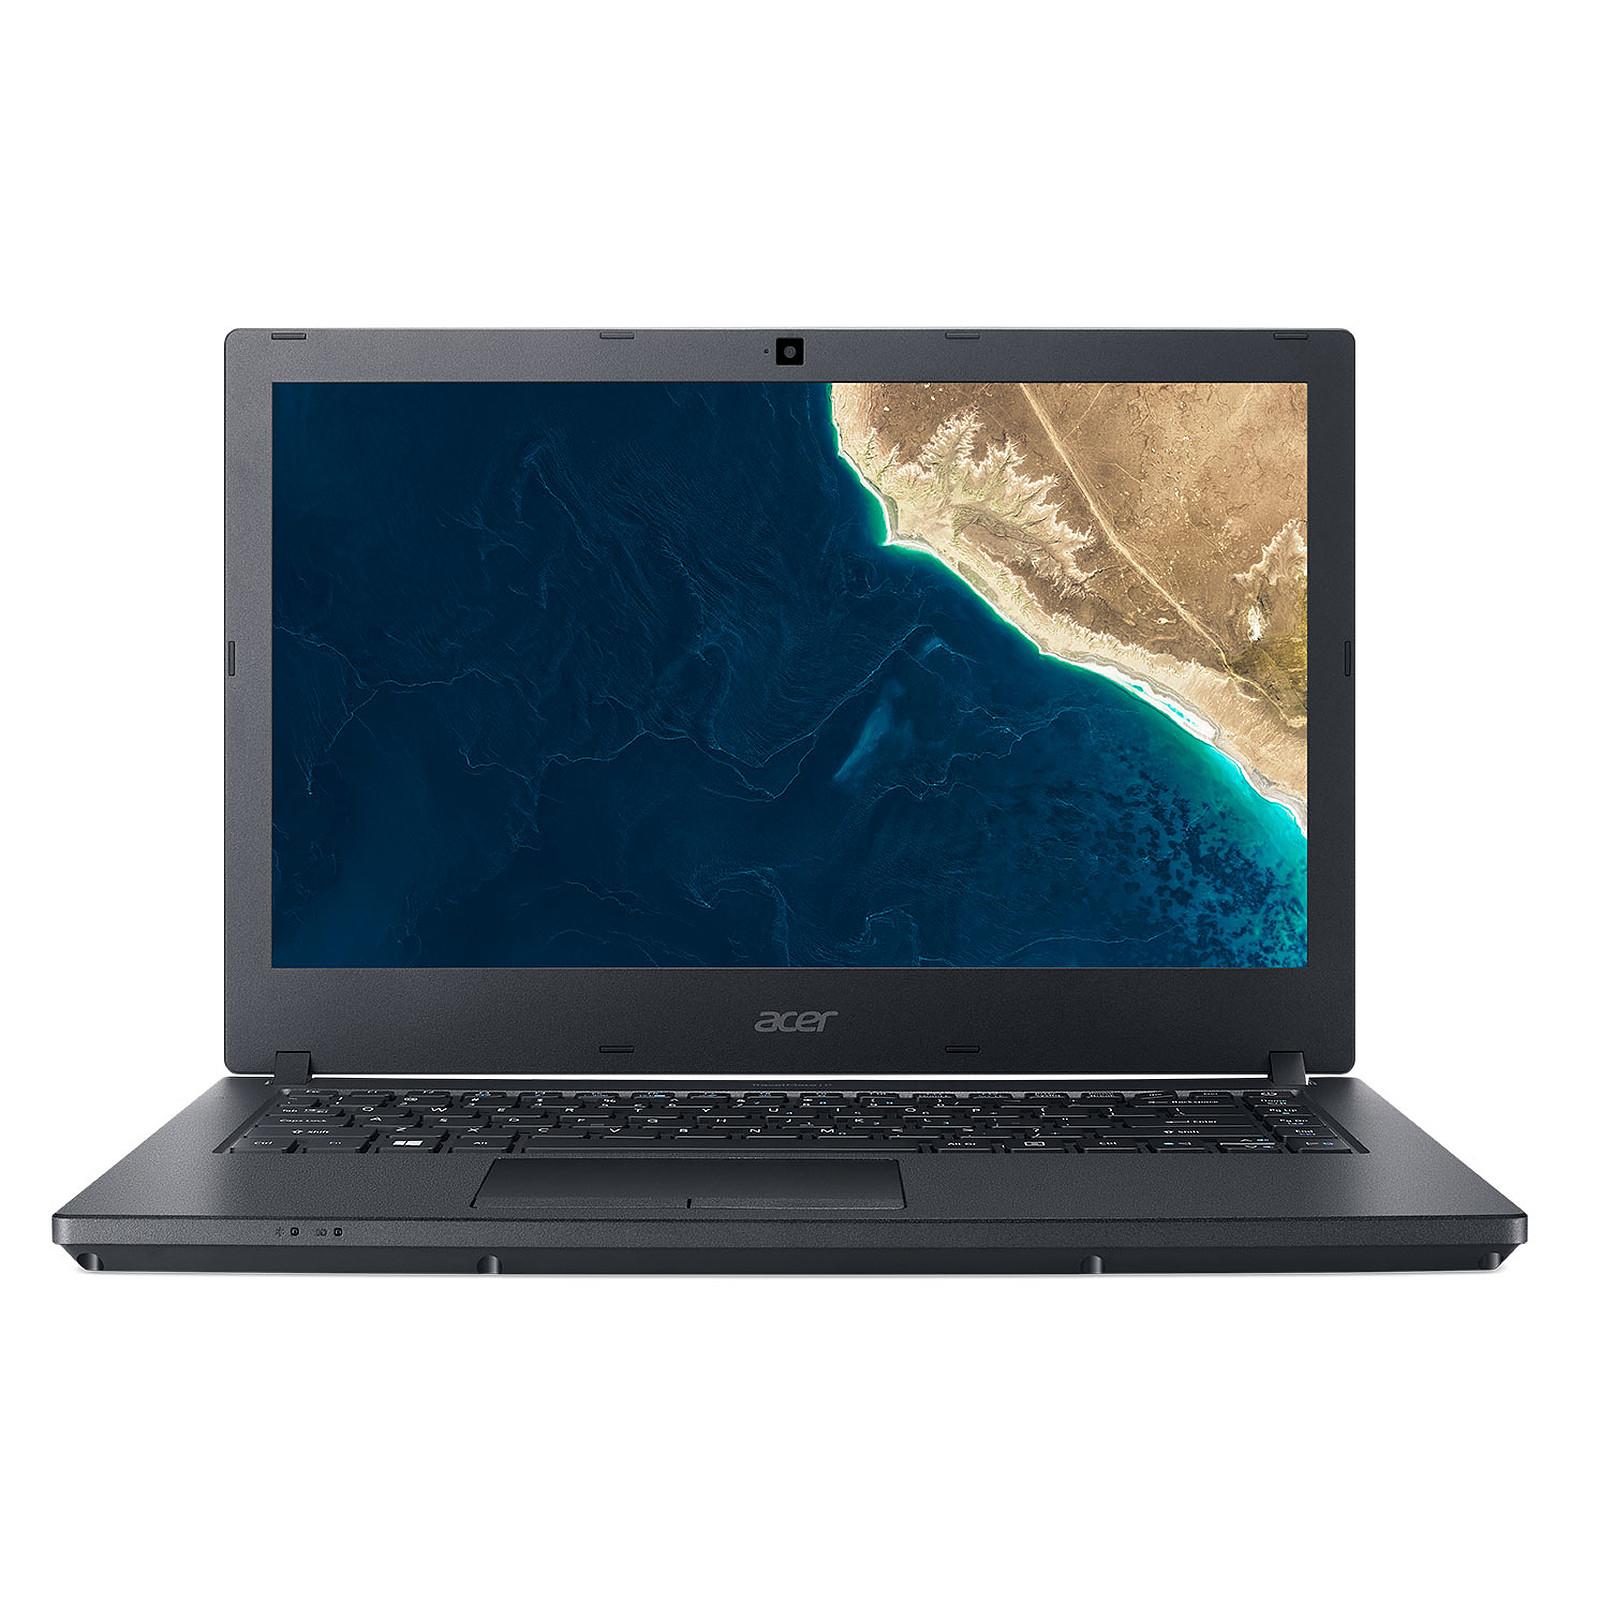 "Portatil 14"" Acer TravelMate Intel i5 8250U 500GB 4GB RAM FHD IPS"